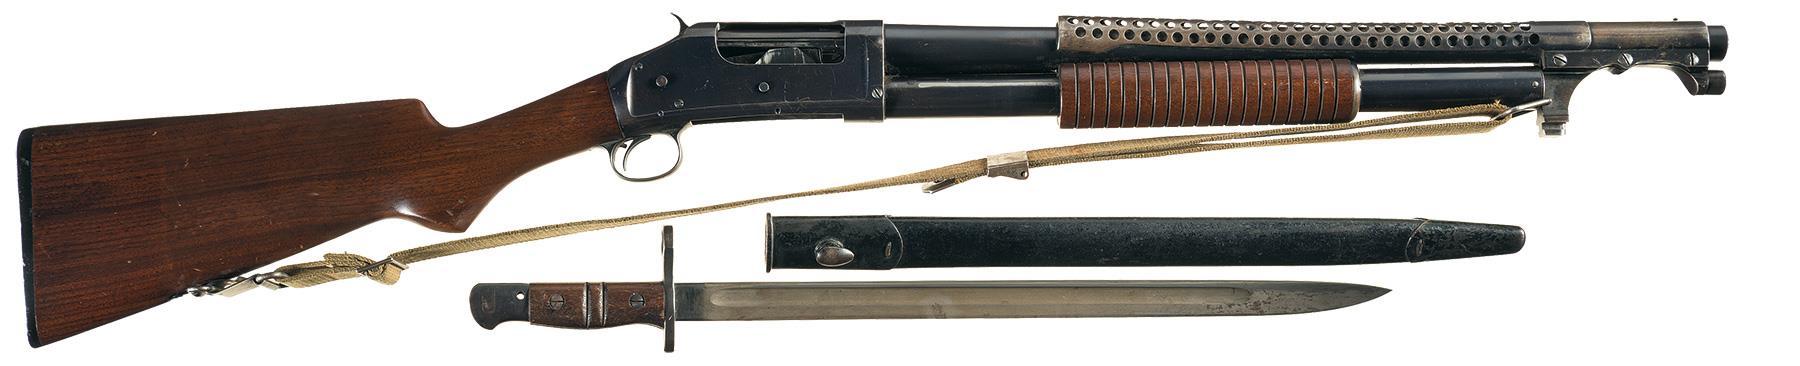 winchester 1897 riot gun serial numbers